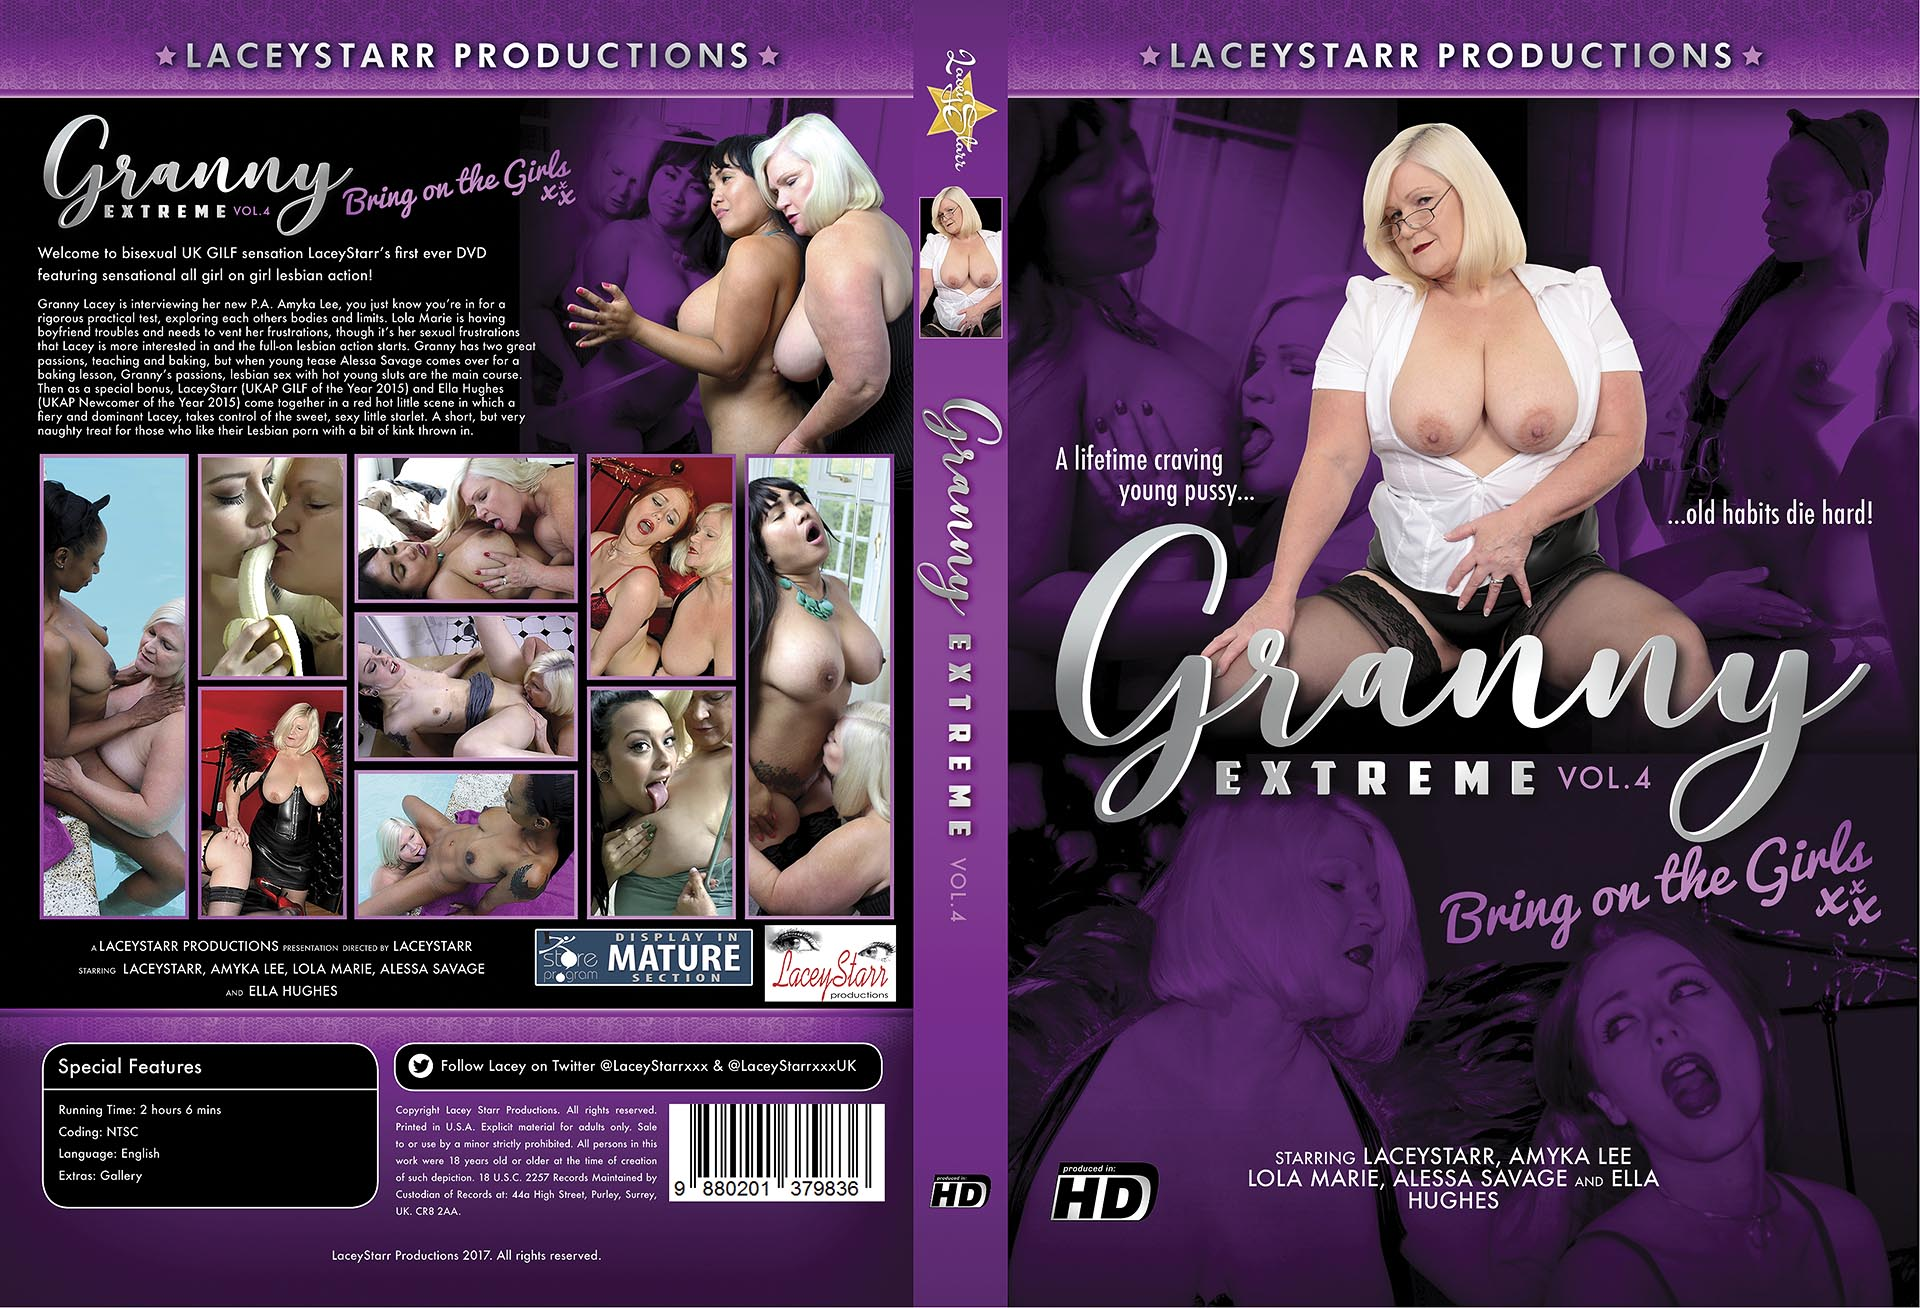 LS_GrannyExtreme_Volume4_UK_Sleeve_Large.jpg